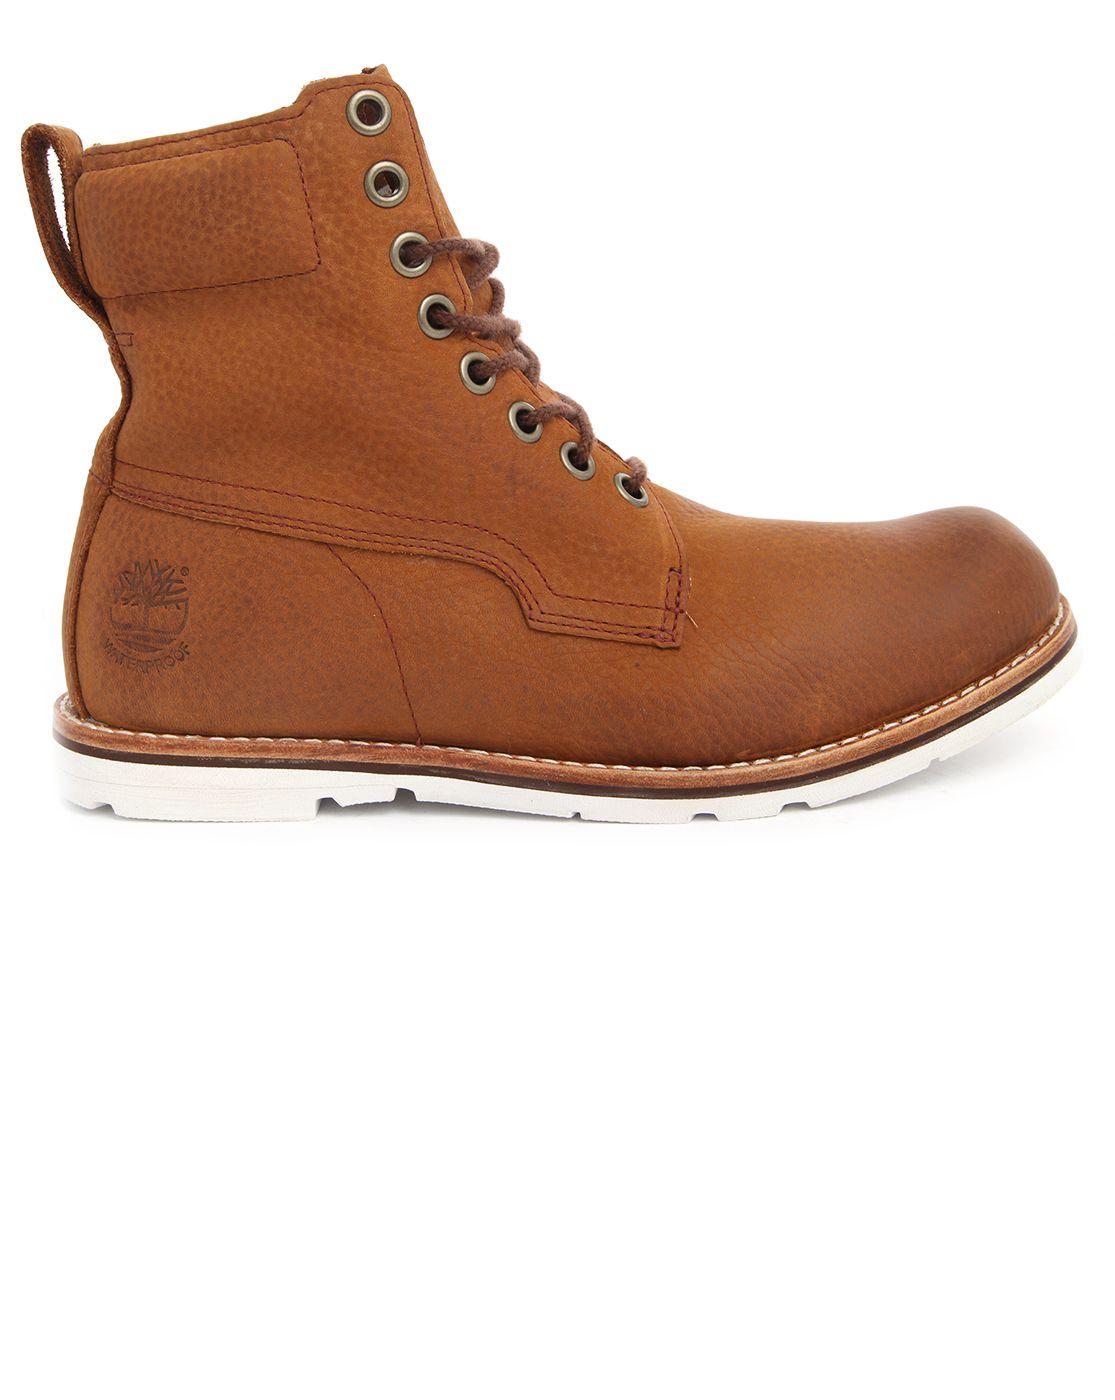 Boots Earthkeepers 6 inch, Nubuk Rugged erdfarben